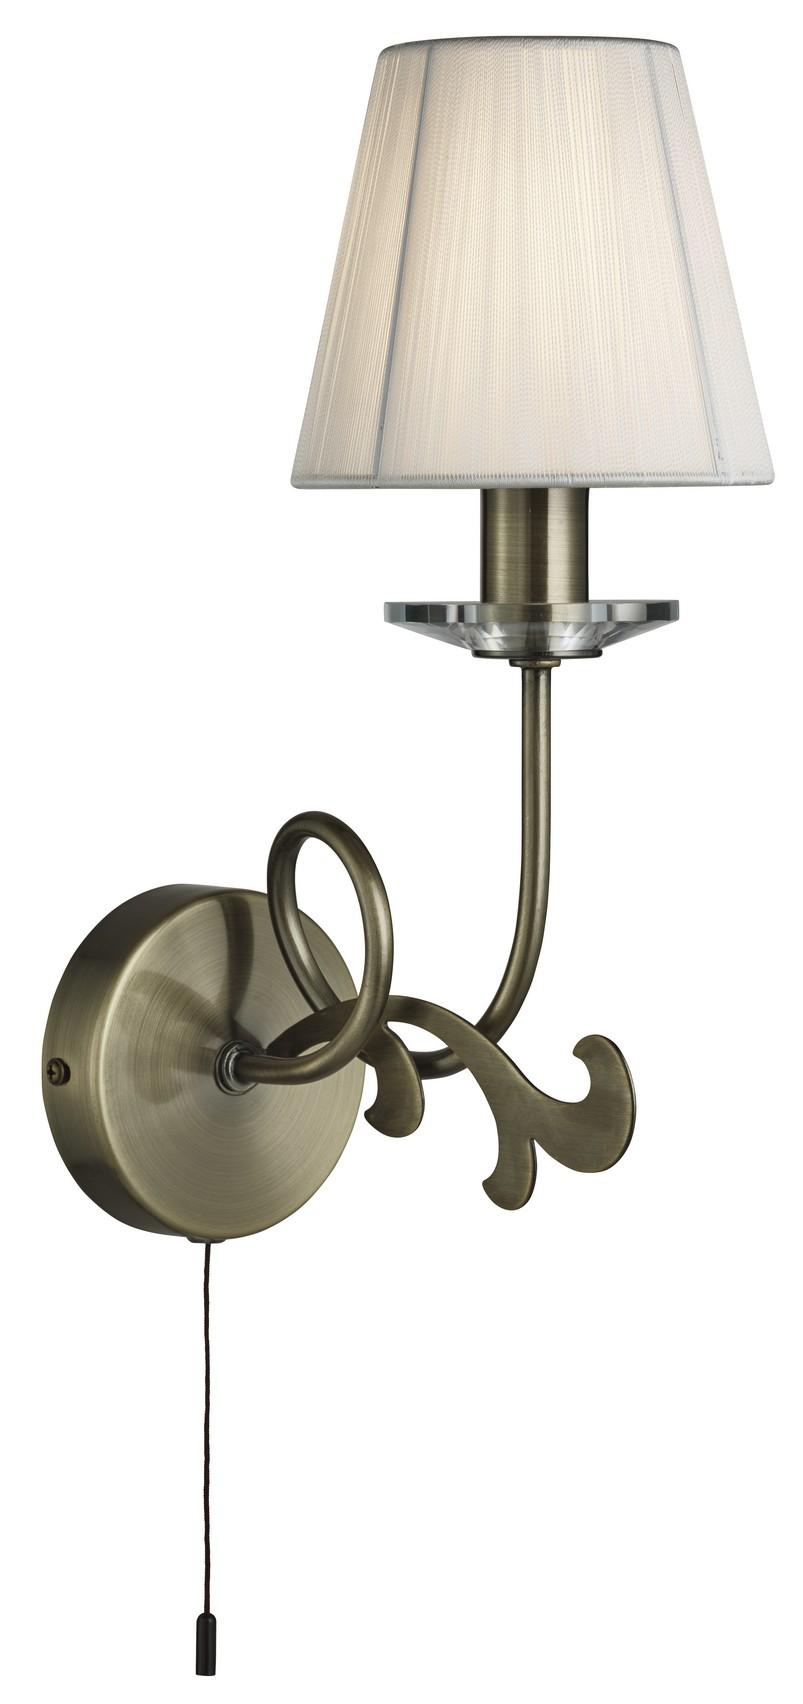 Бра Arte lamp Lizzy a9531ap-1ab бра arte lamp lizzy a9531lt 1ab